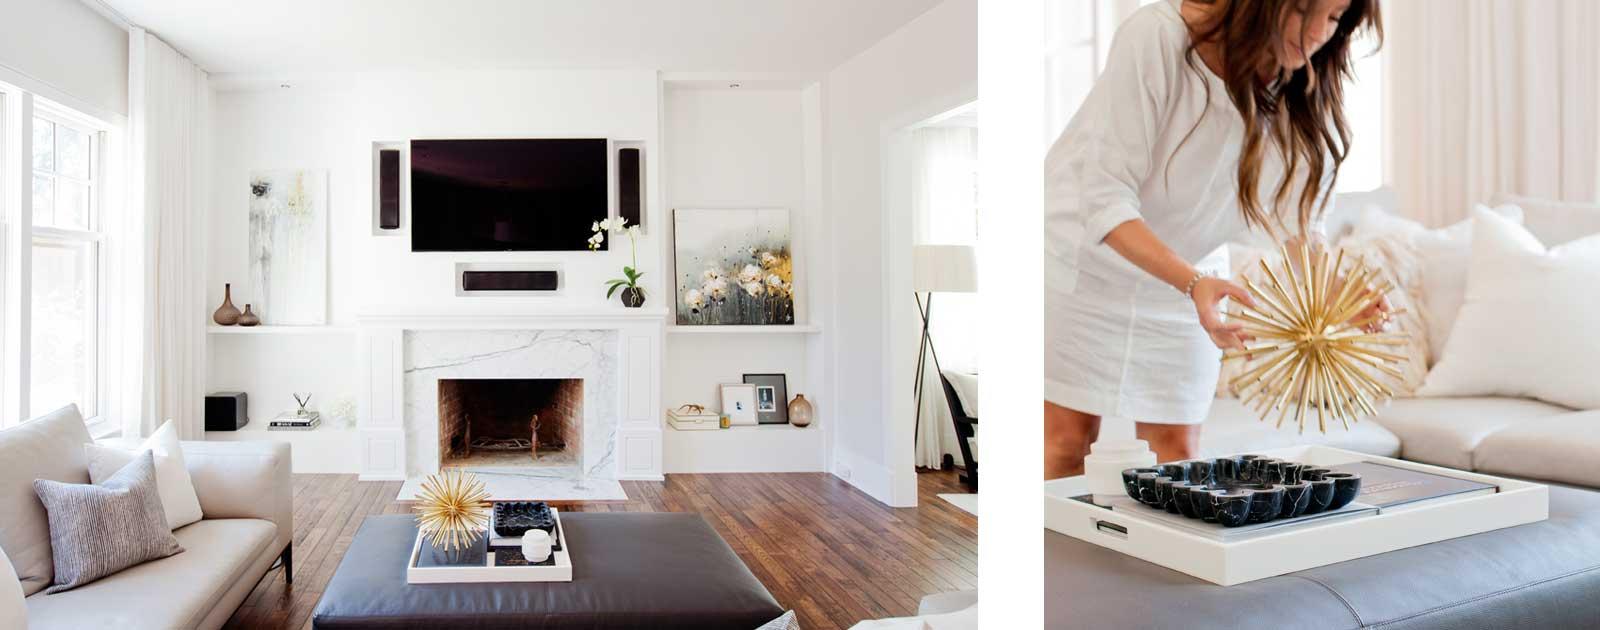 Riverdale Residence II | Calgary Interior Design